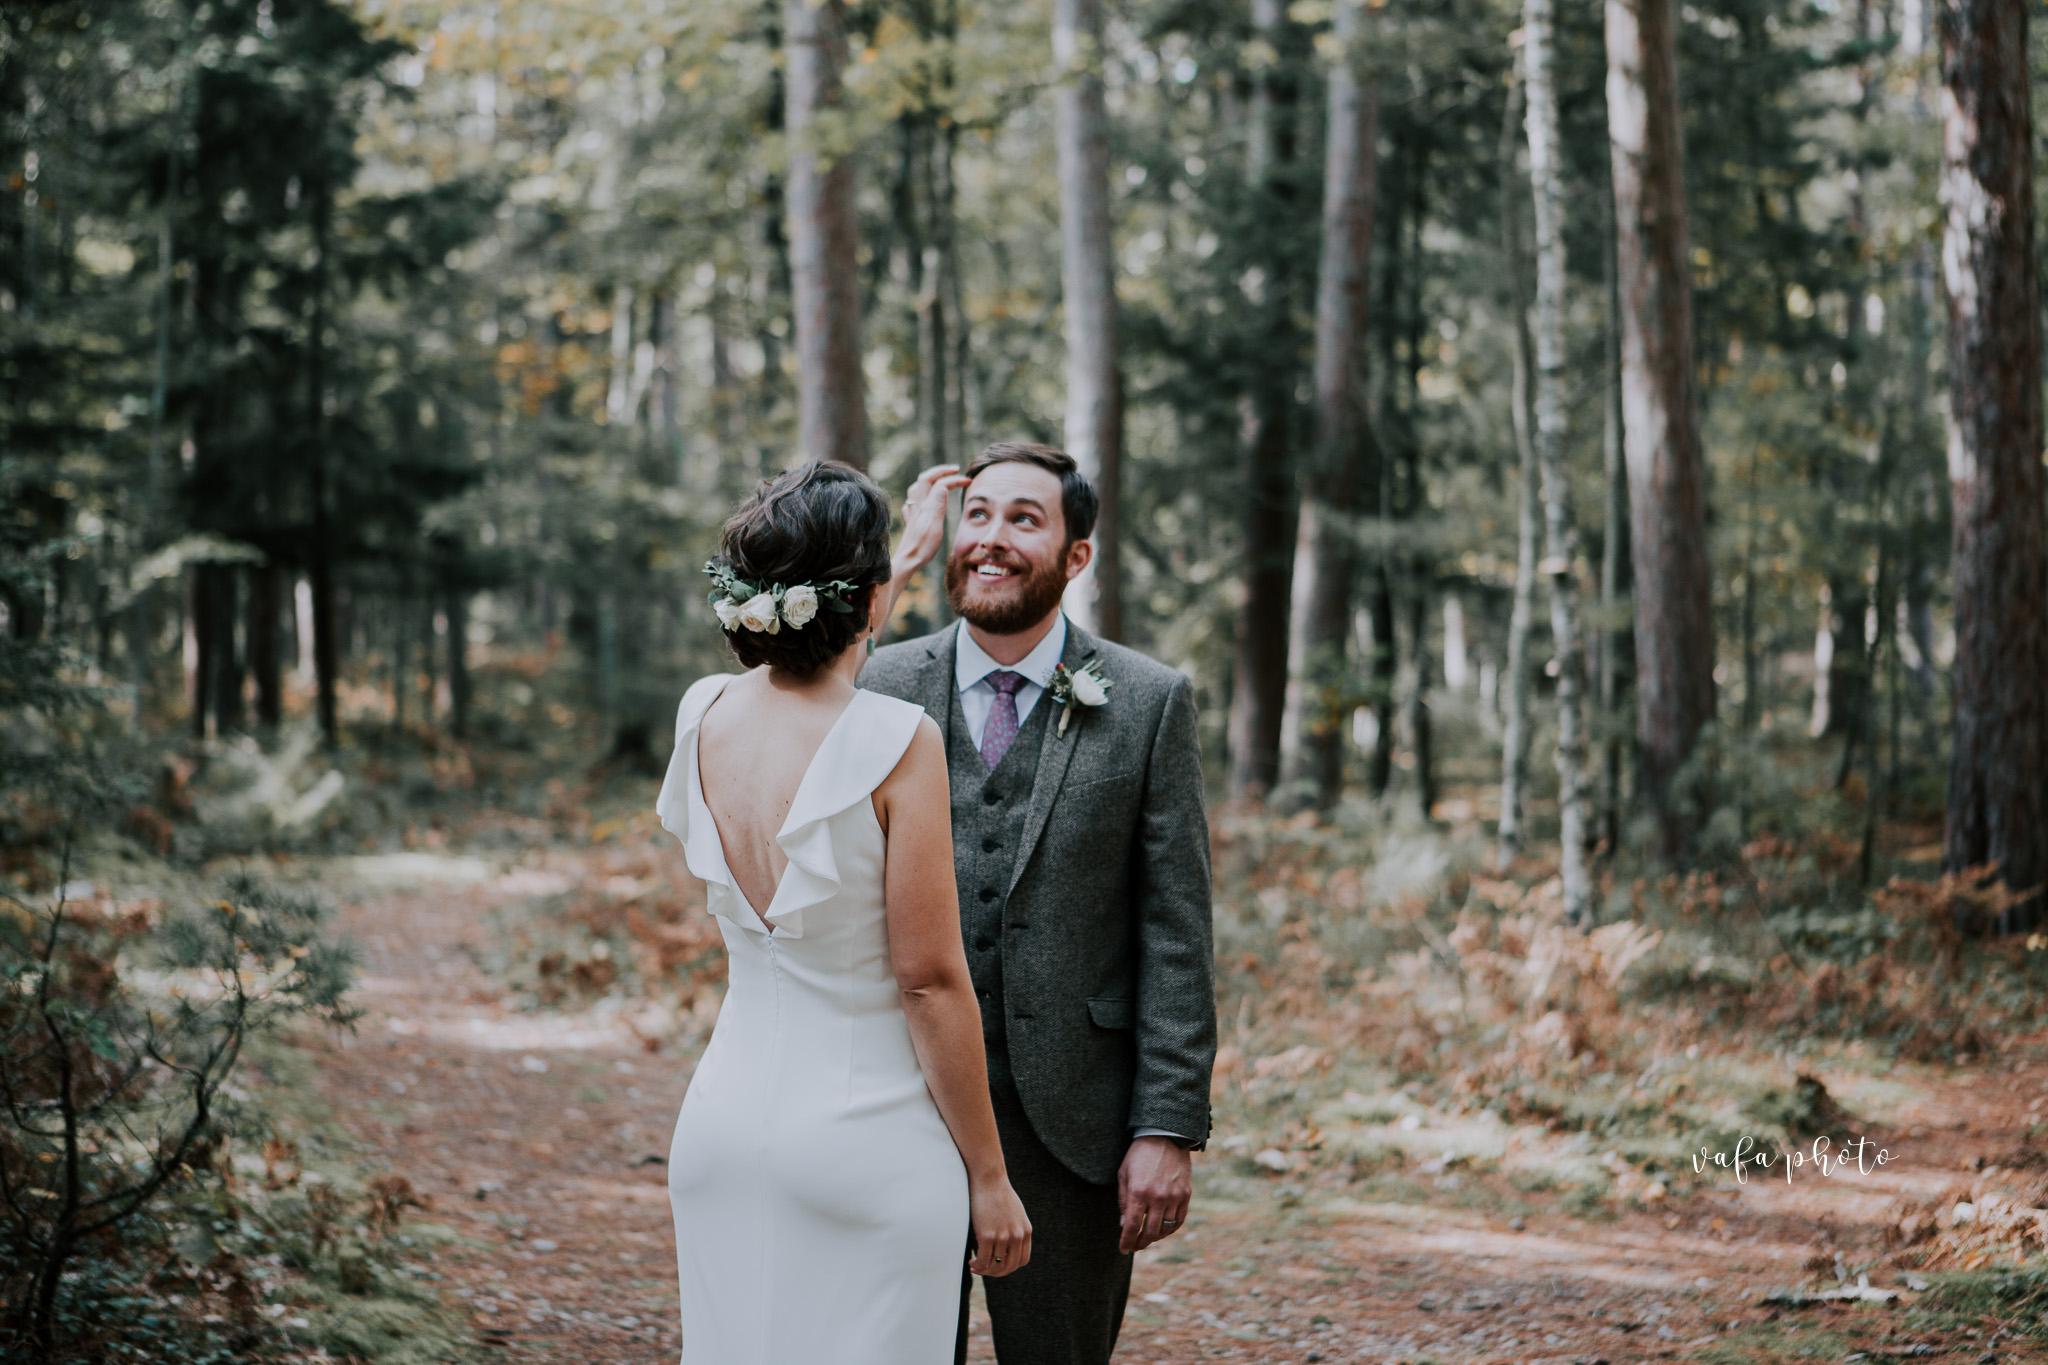 Little-Presque-Isle-Michigan-Wedding-Kim-Kyle-Vafa-Photo-21.jpg